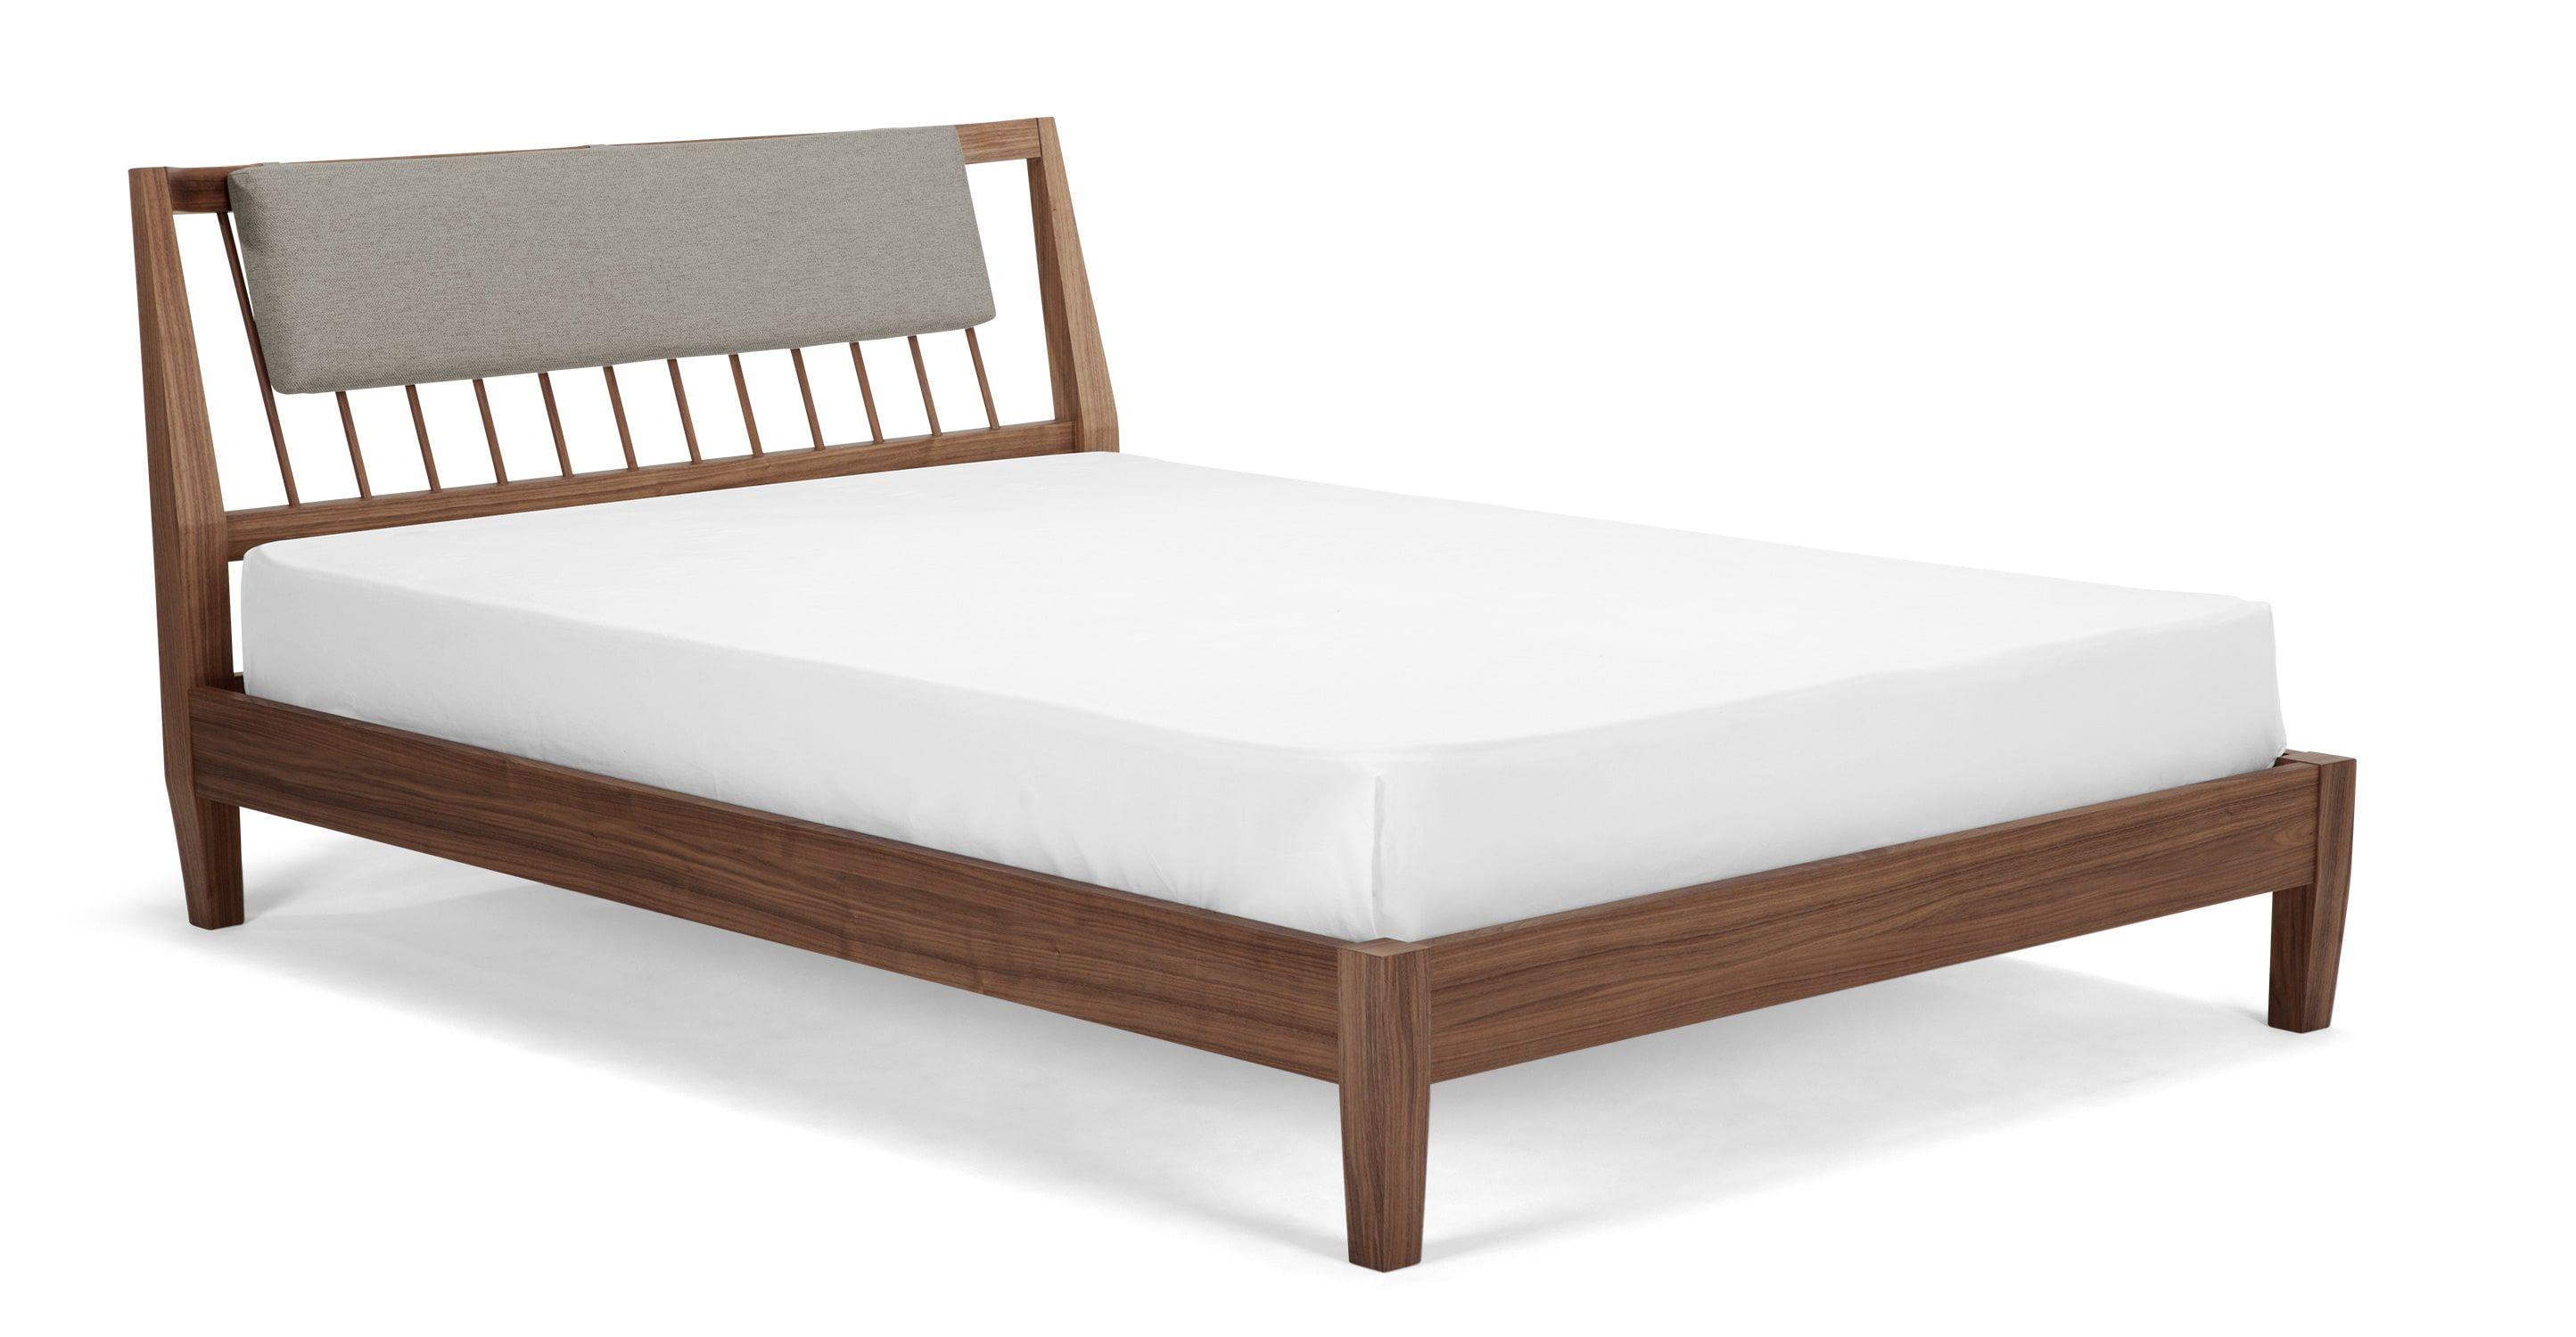 Mara King Size Bed Walnut From Made Com Dark Wood Express